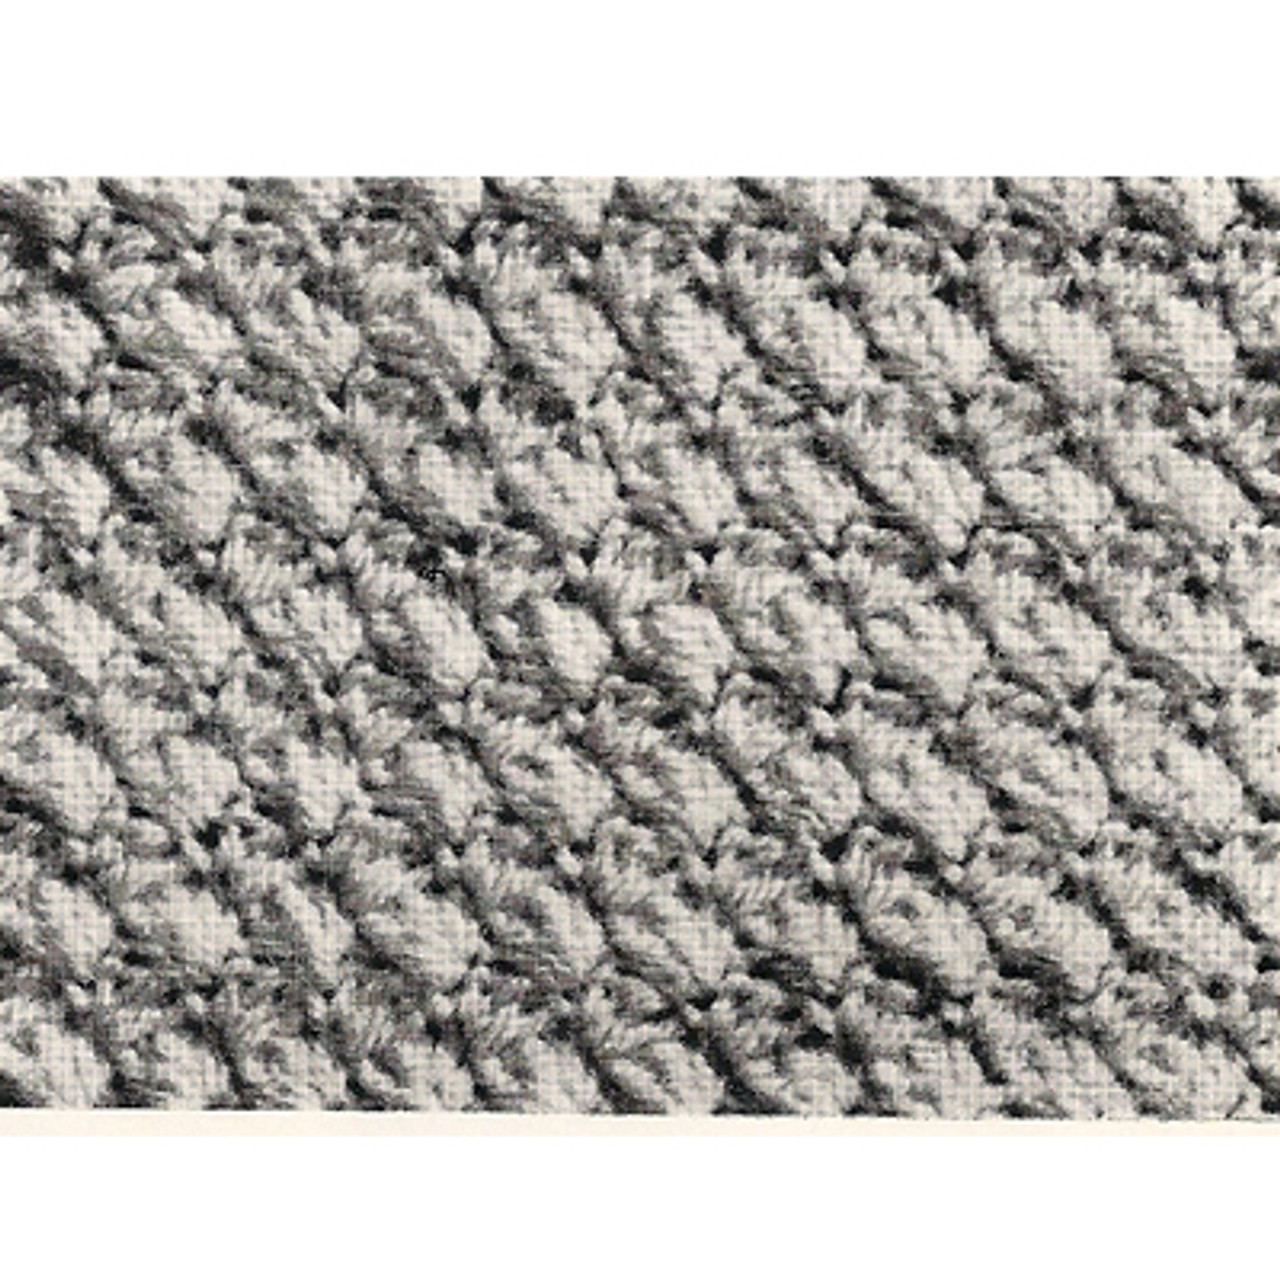 Pattern Stitch for Crochet Baby Set